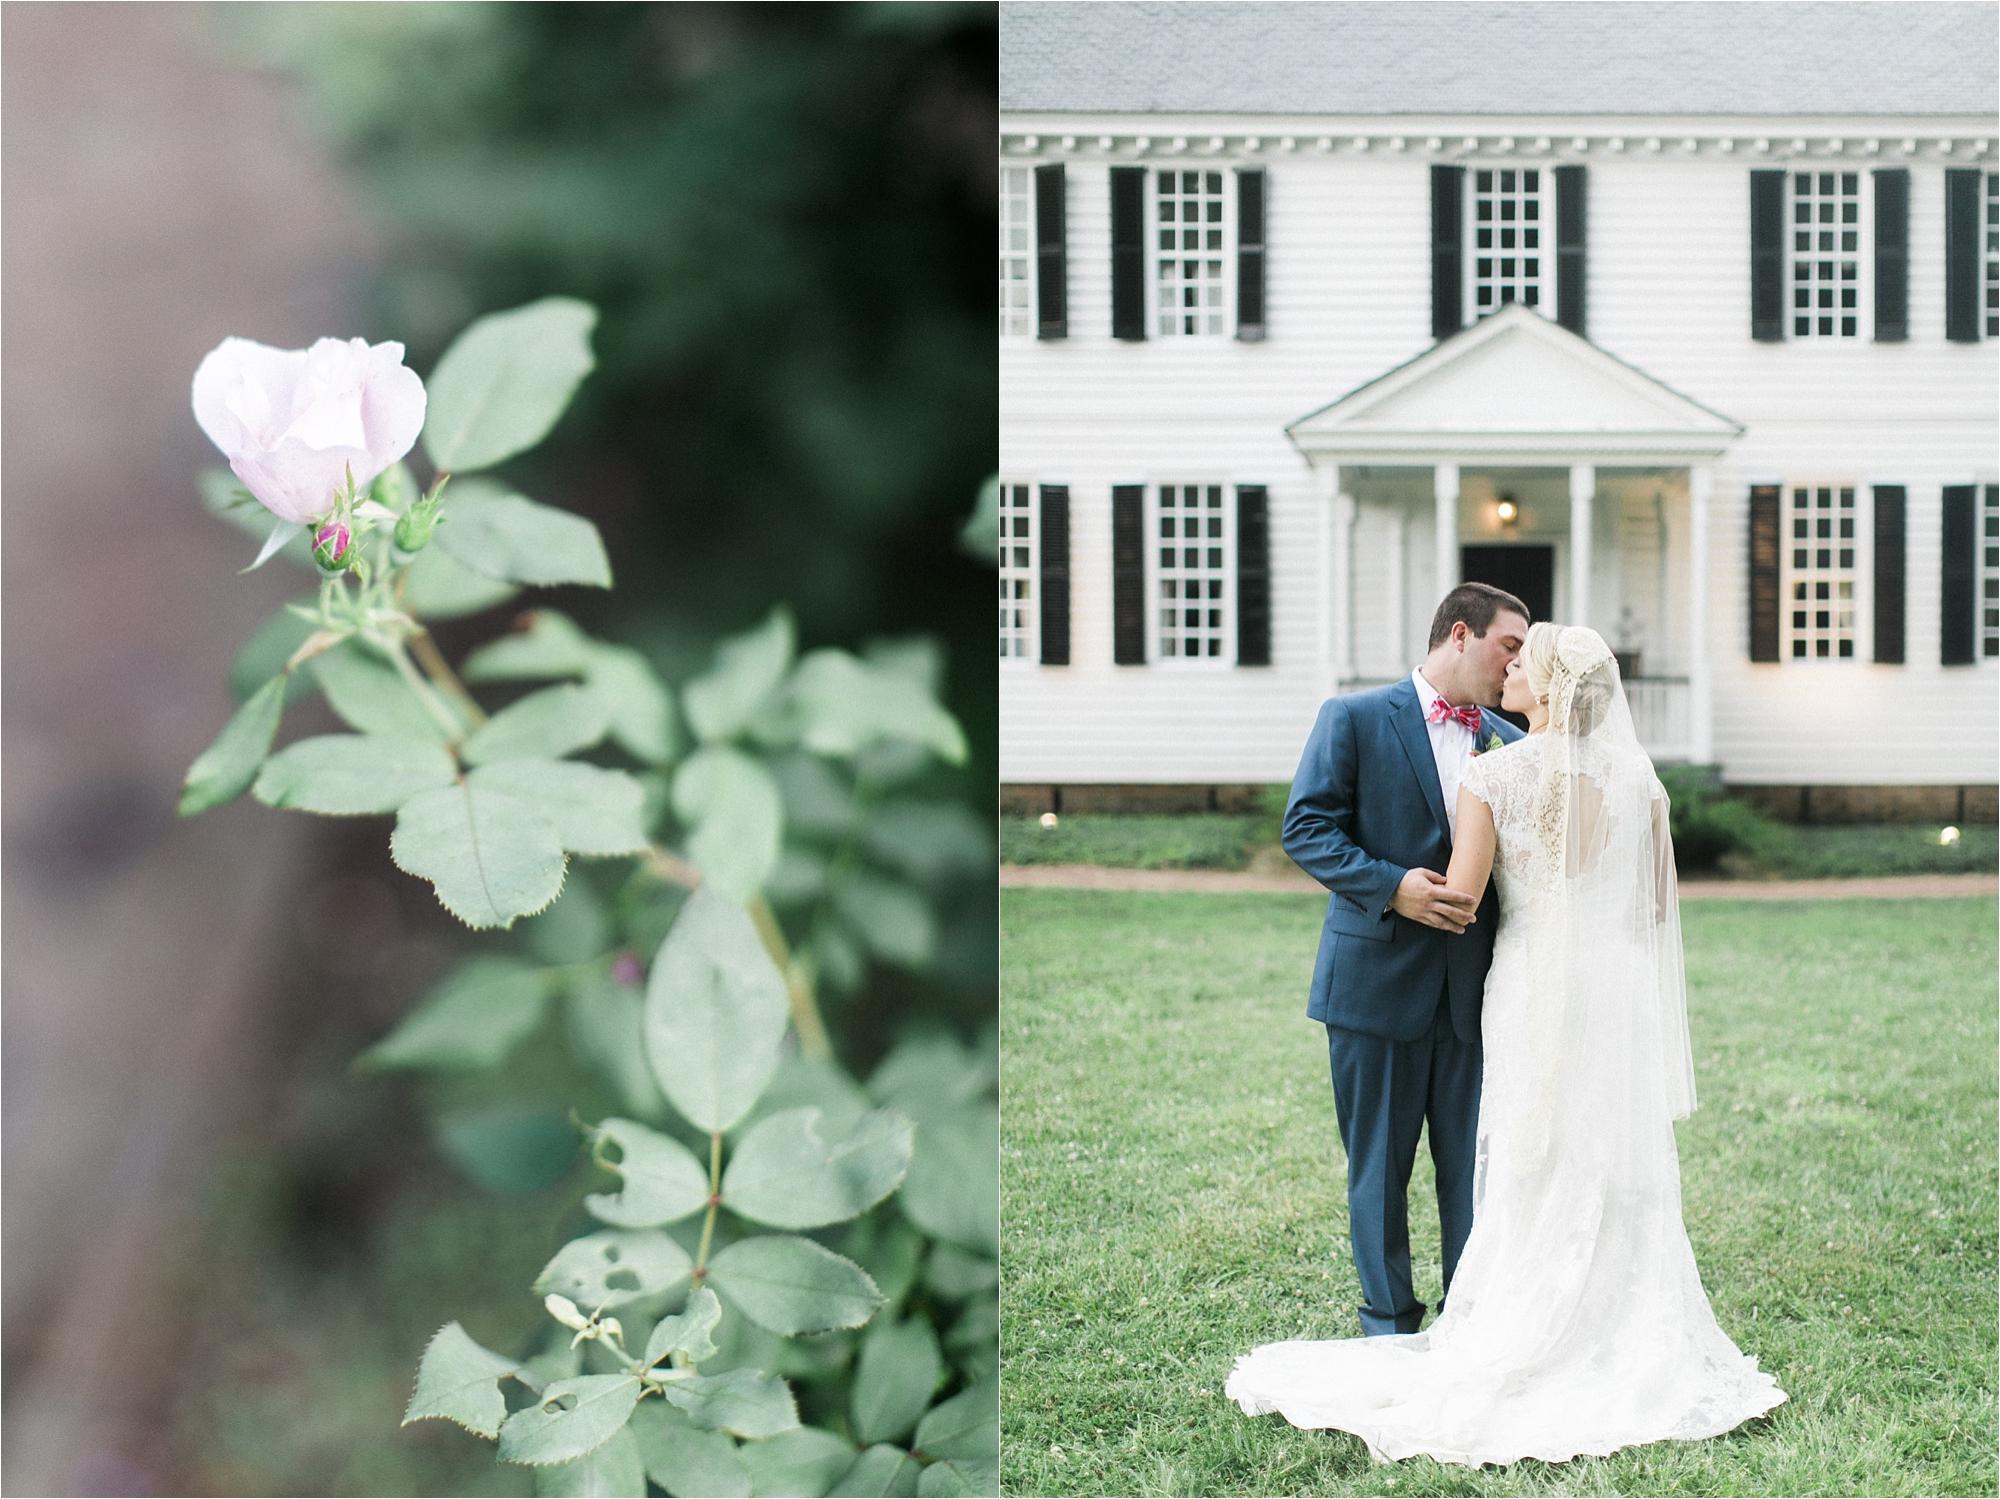 richmond-virginia-tuckahoe-plantation-coral-summer-wedding-stephanie-yonce-photos_0038.jpg